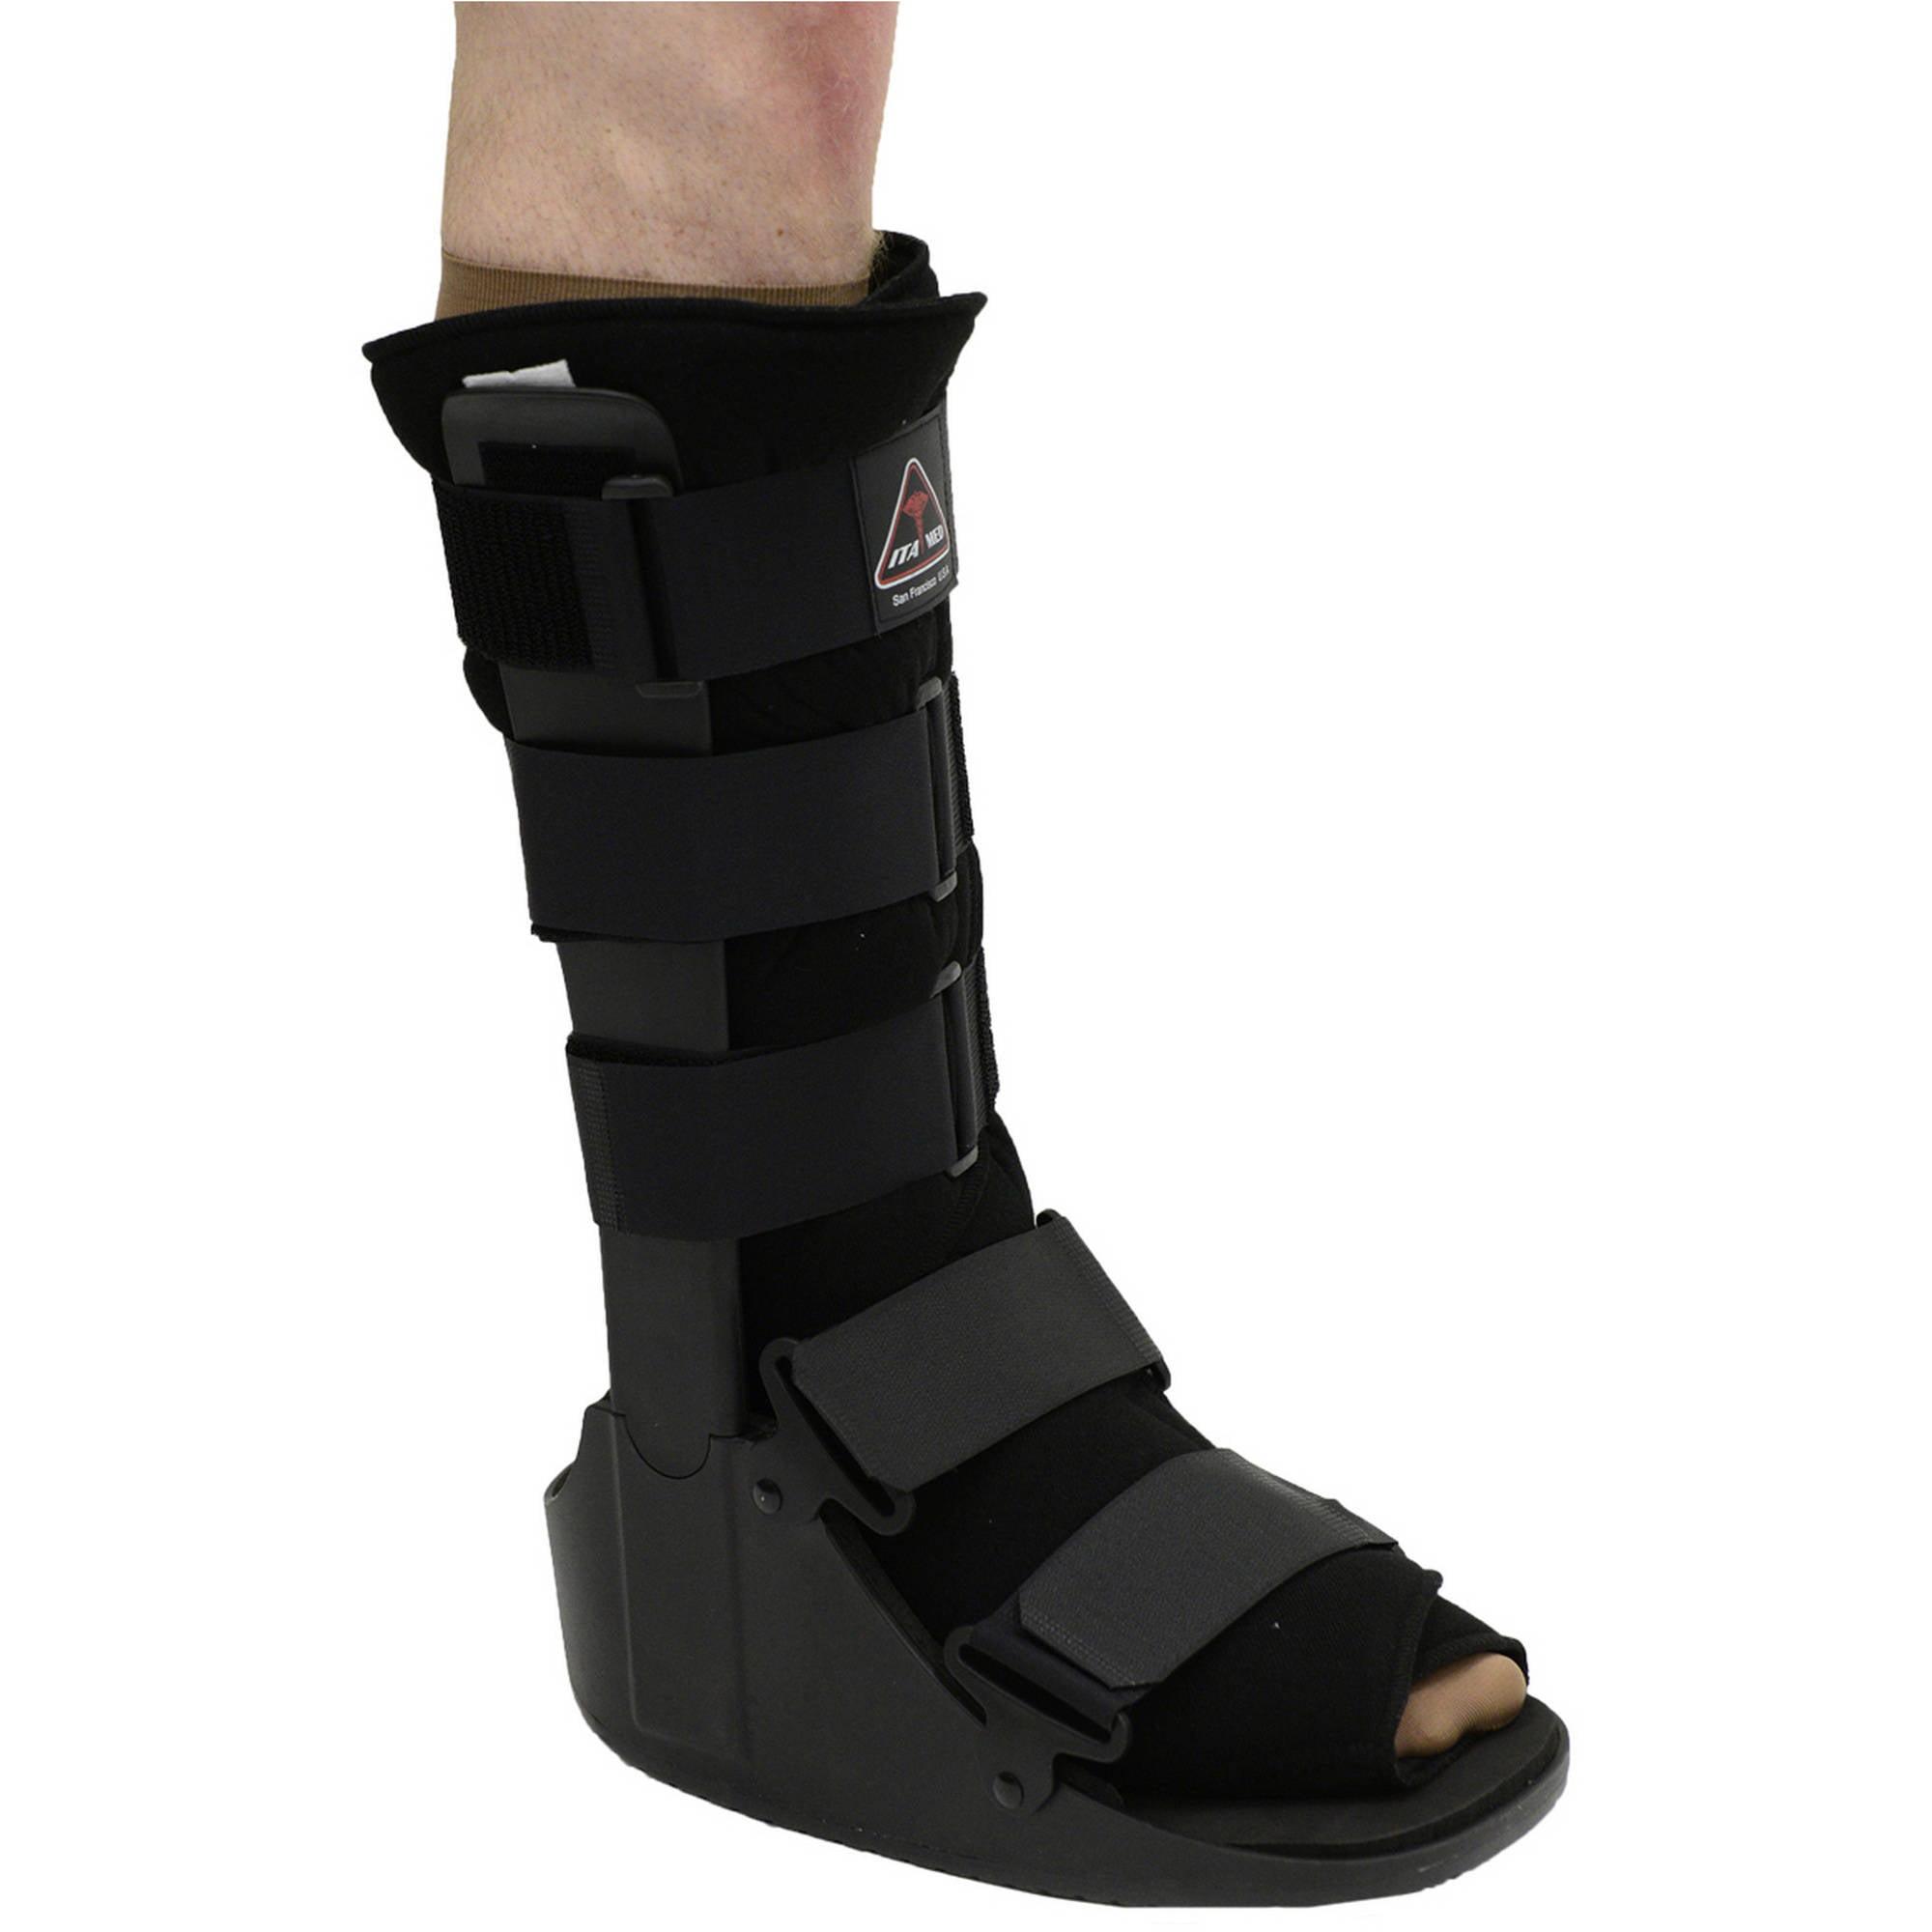 Closed toe medical walking shoe foot protection boot - Closed Toe Medical Walking Shoe Foot Protection Boot 51